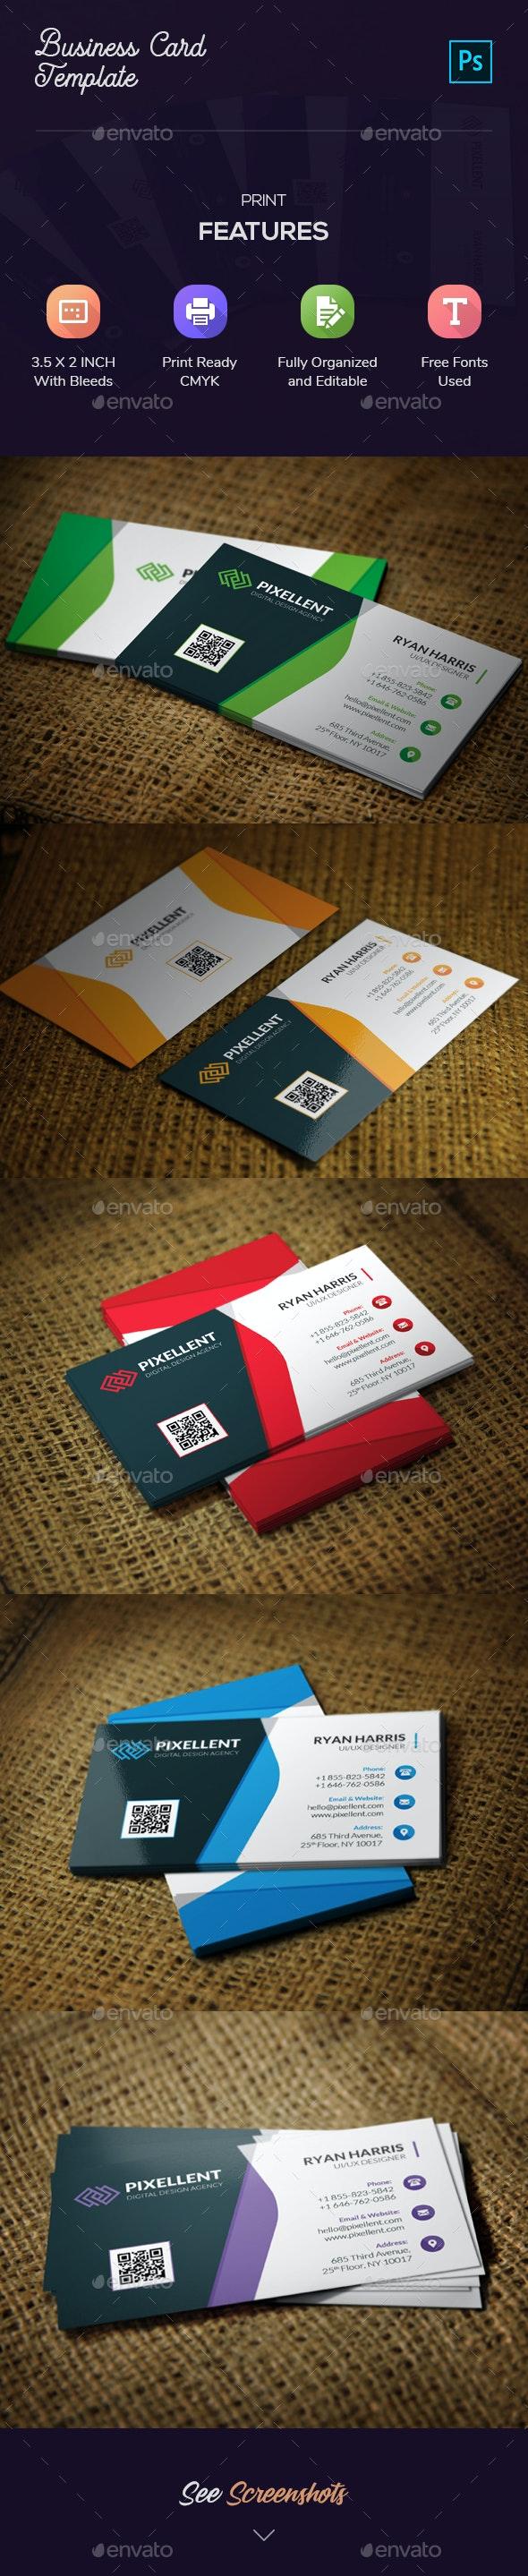 Corporate Business Card Template - Corporate Business Cards